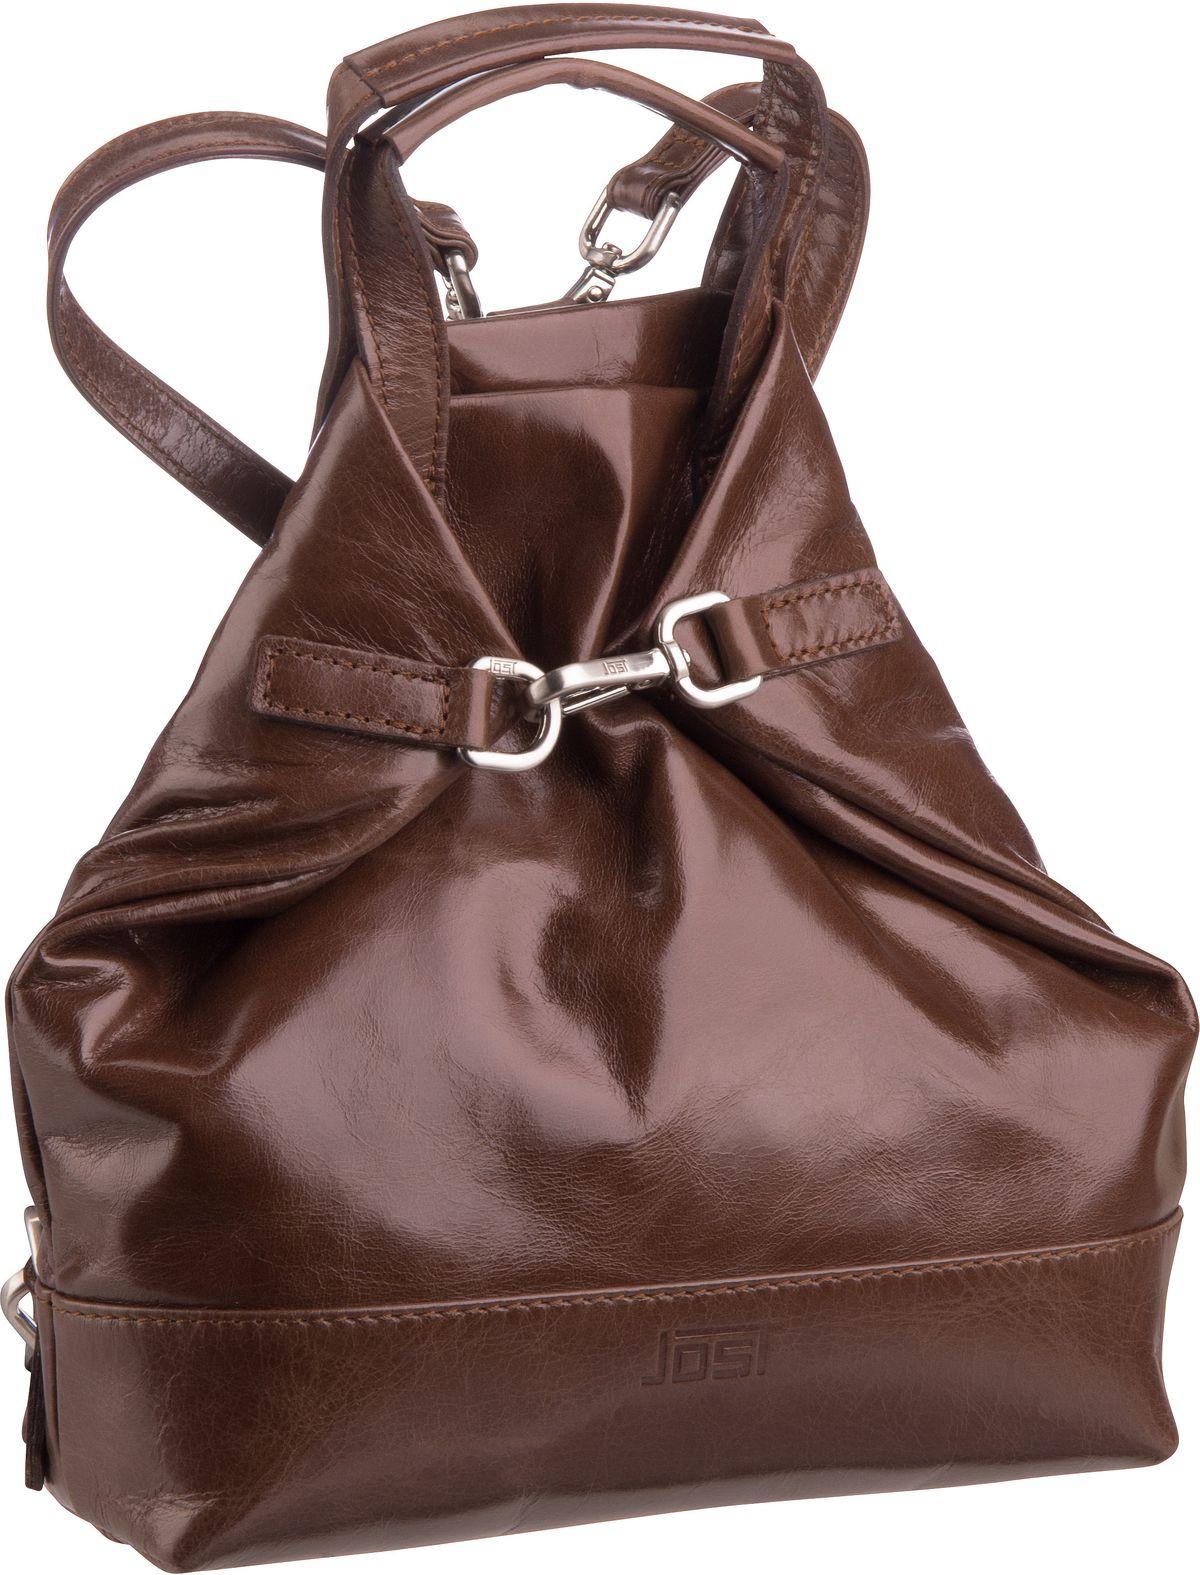 Rucksack / Daypack Boda 6617 X-Change Bag Mini Mocca